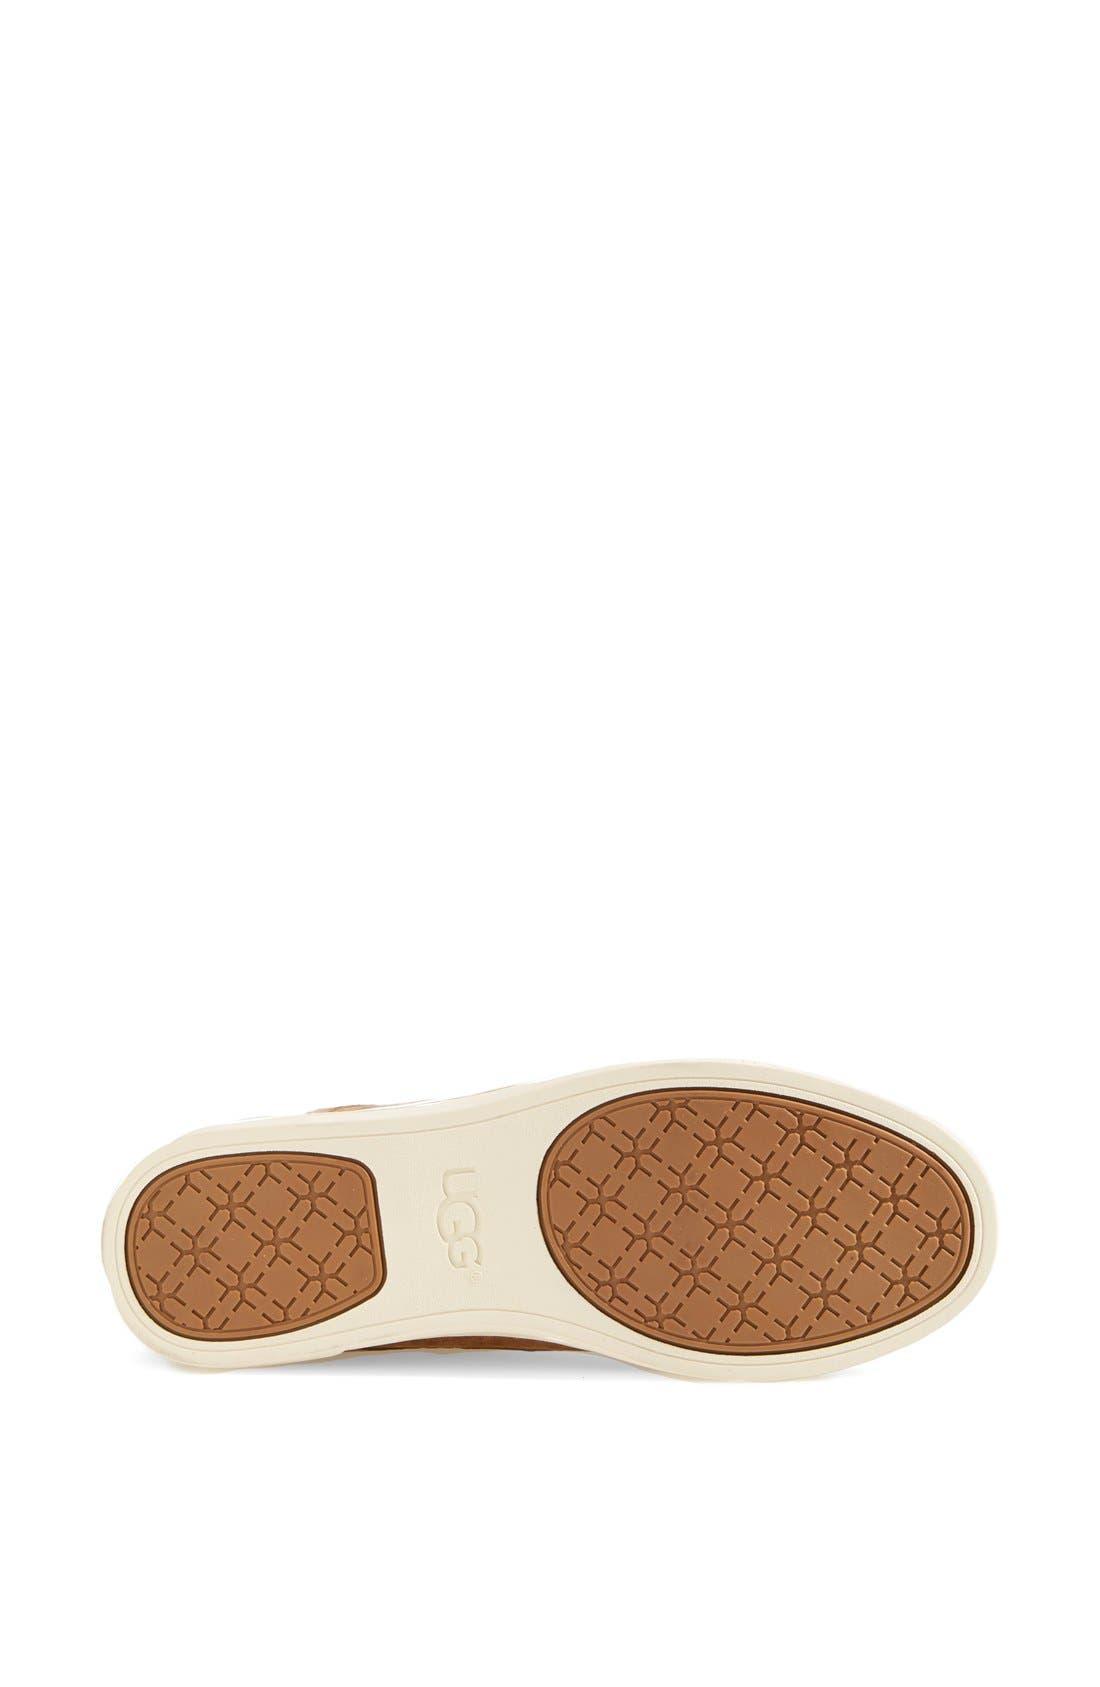 Alternate Image 4  - UGG® Fierce Water Resistant Suede Slip-On Sneaker (Nordstrom Exclusive Color) (Women)